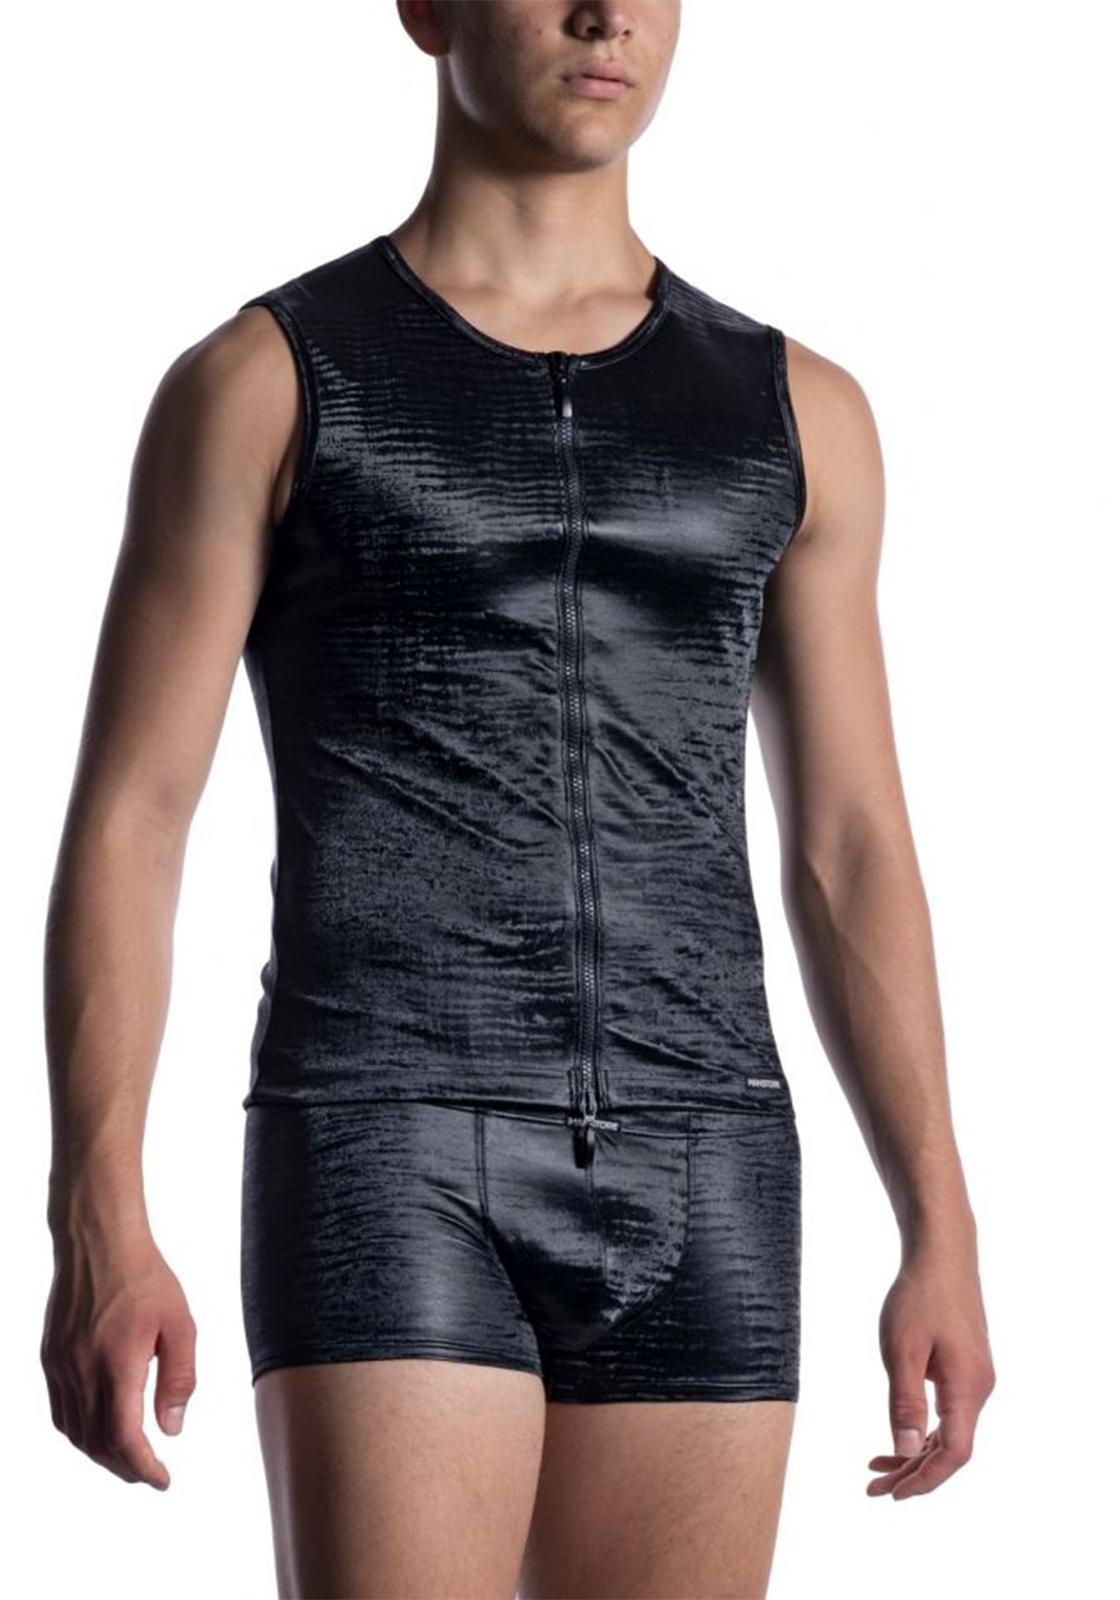 Manstore Zipped Vest